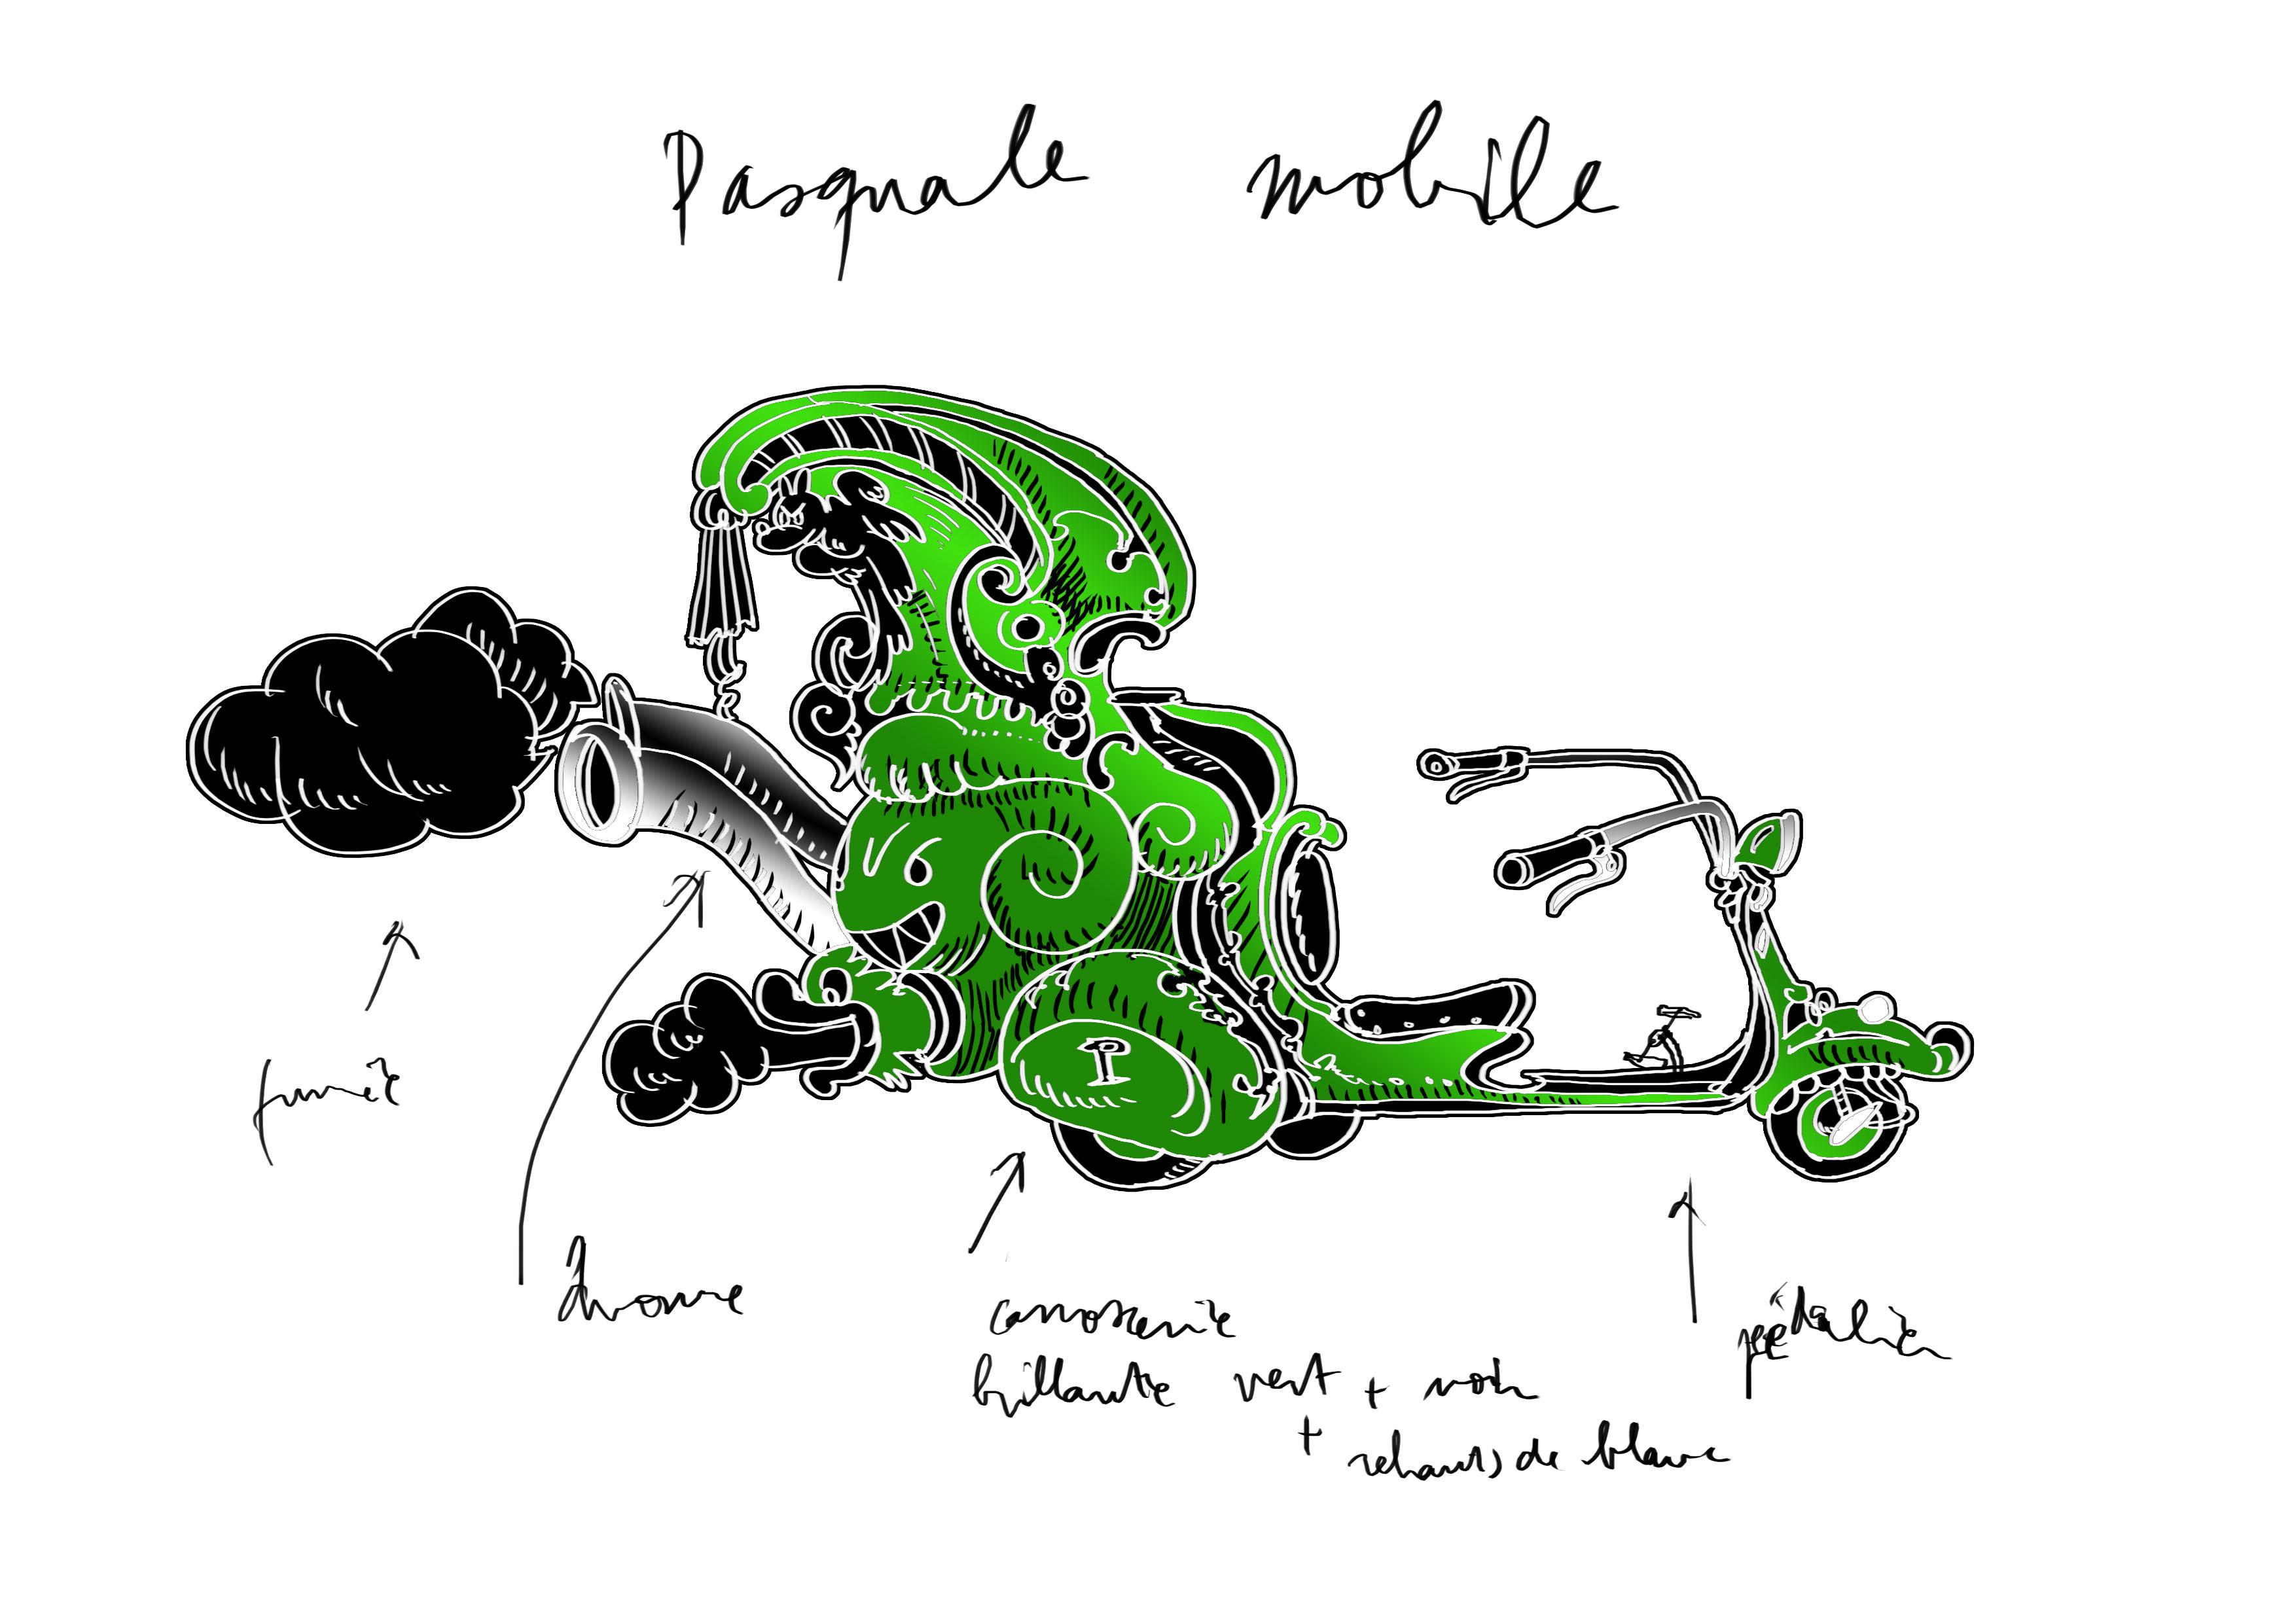 ·: Nicolas Buffe :· - pasquale mobile v2